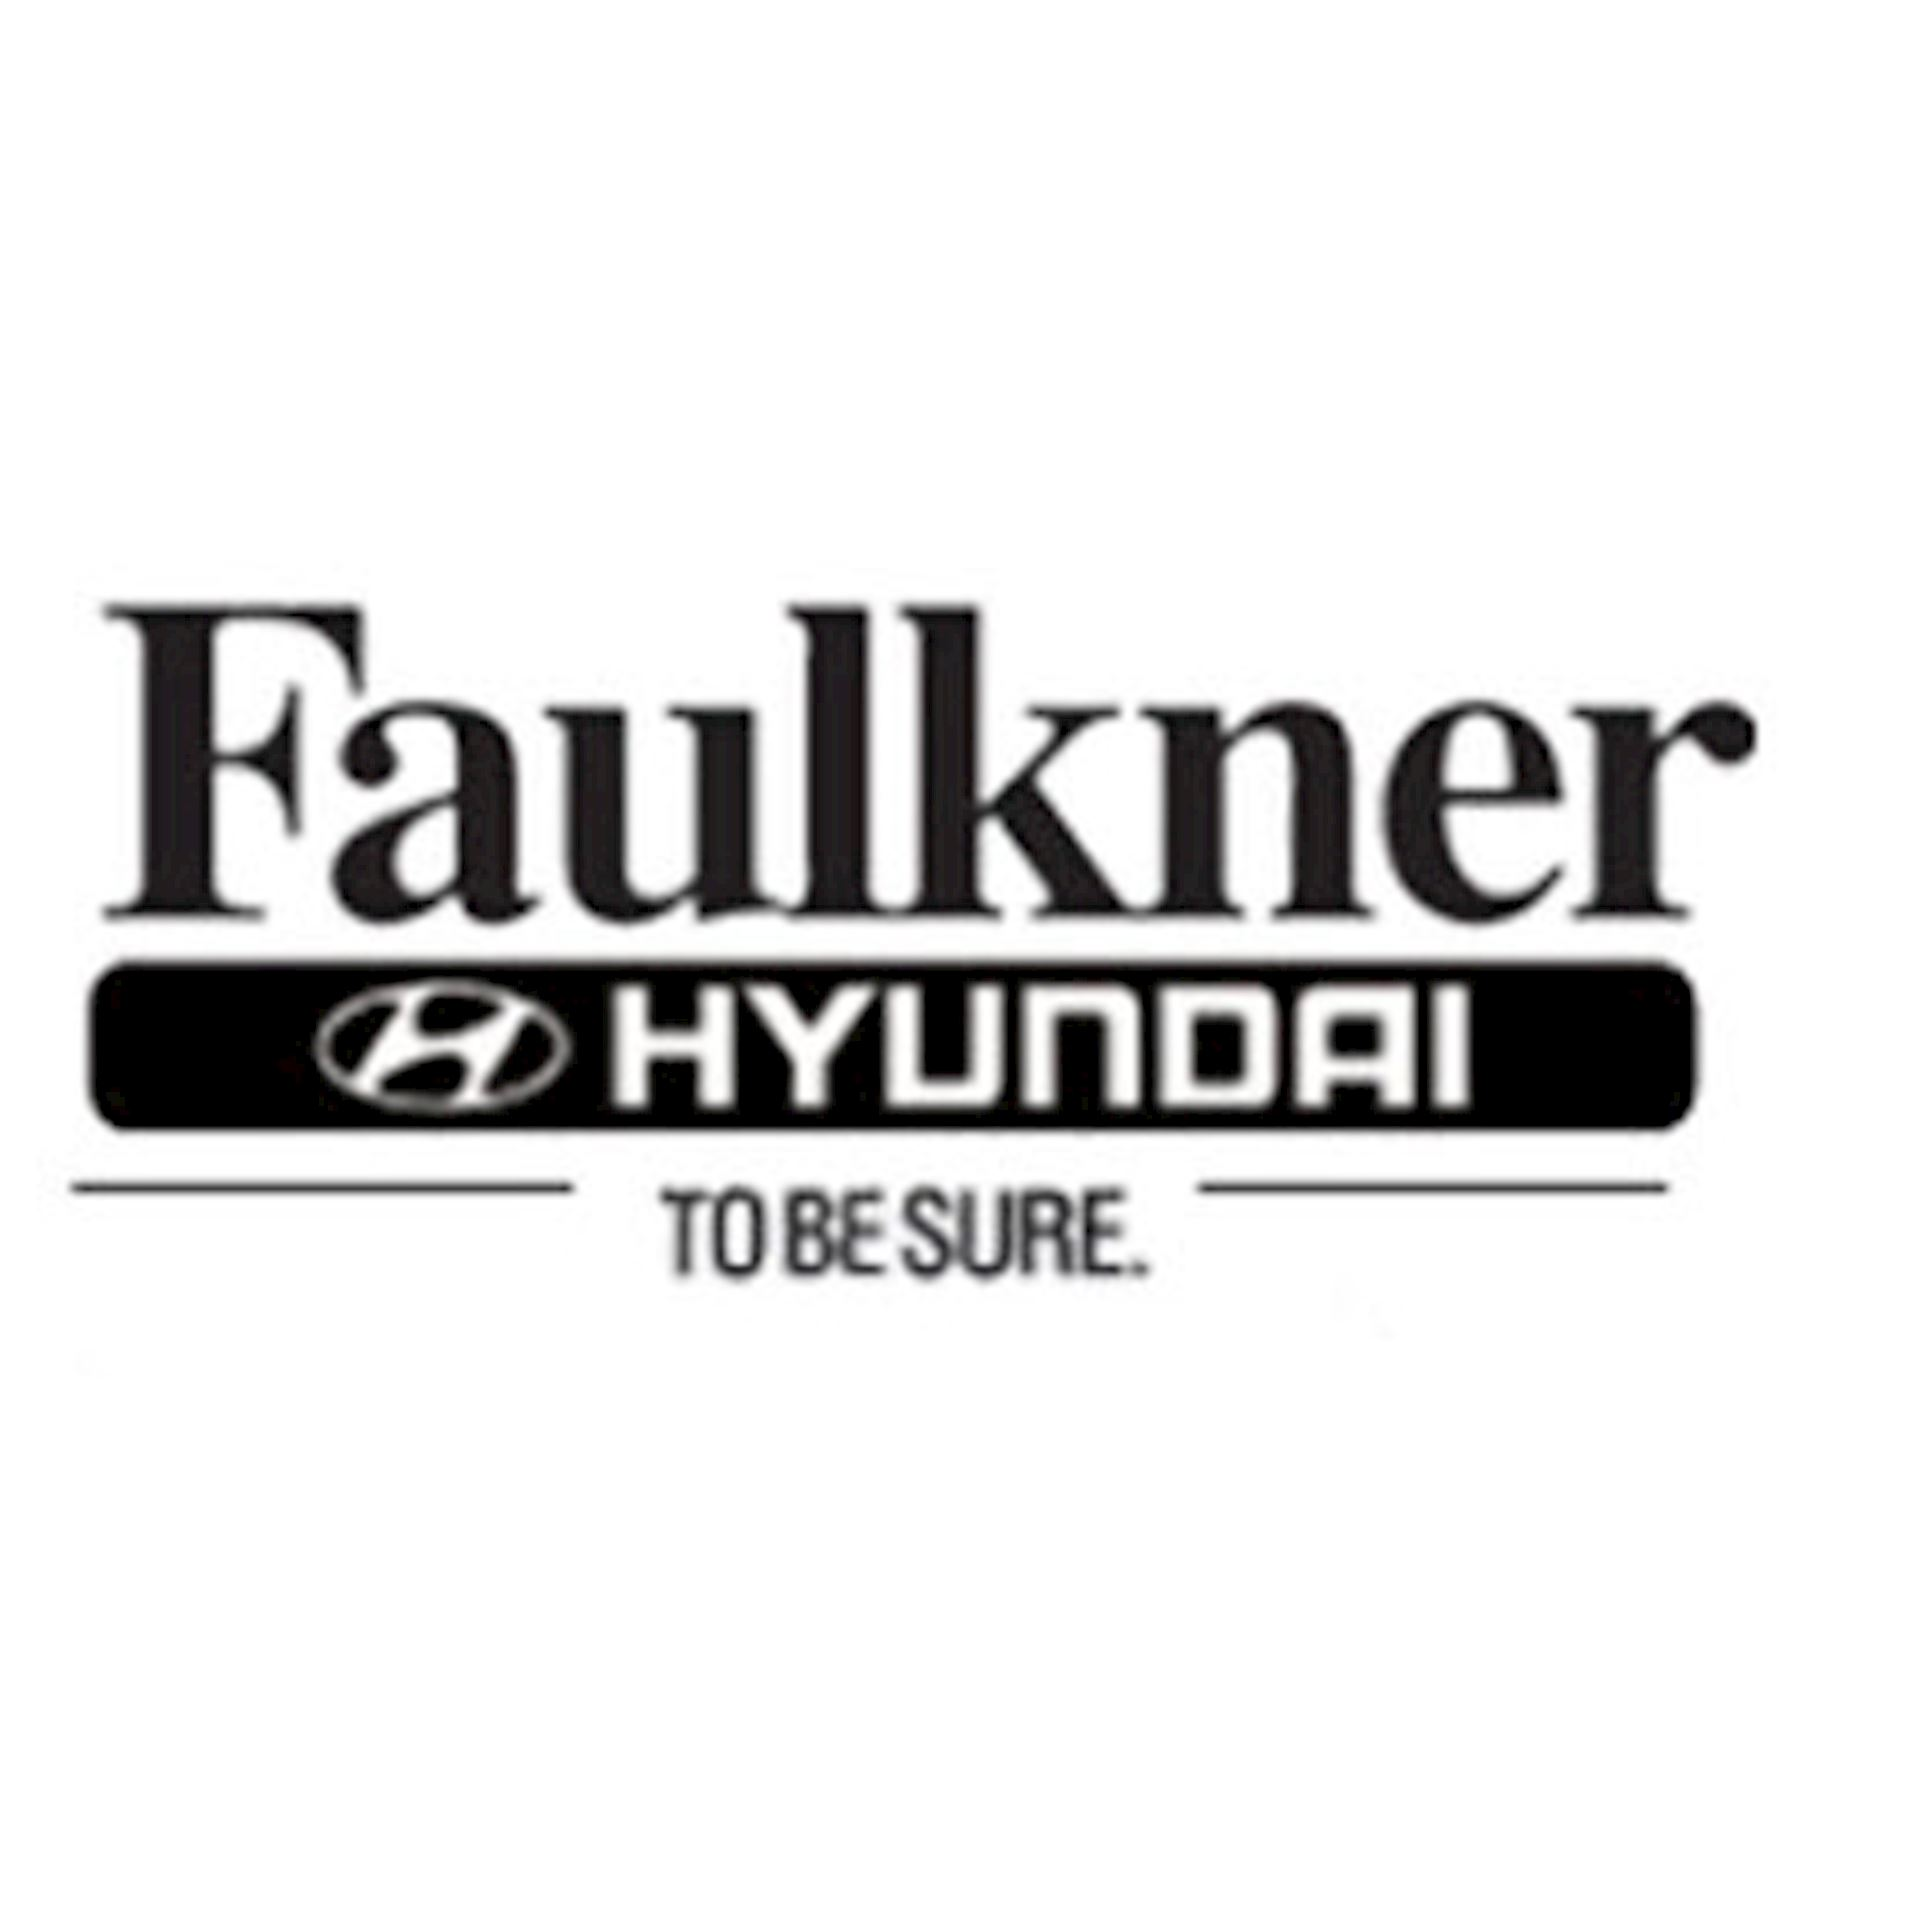 Faulkner Hyundai Philadelphia